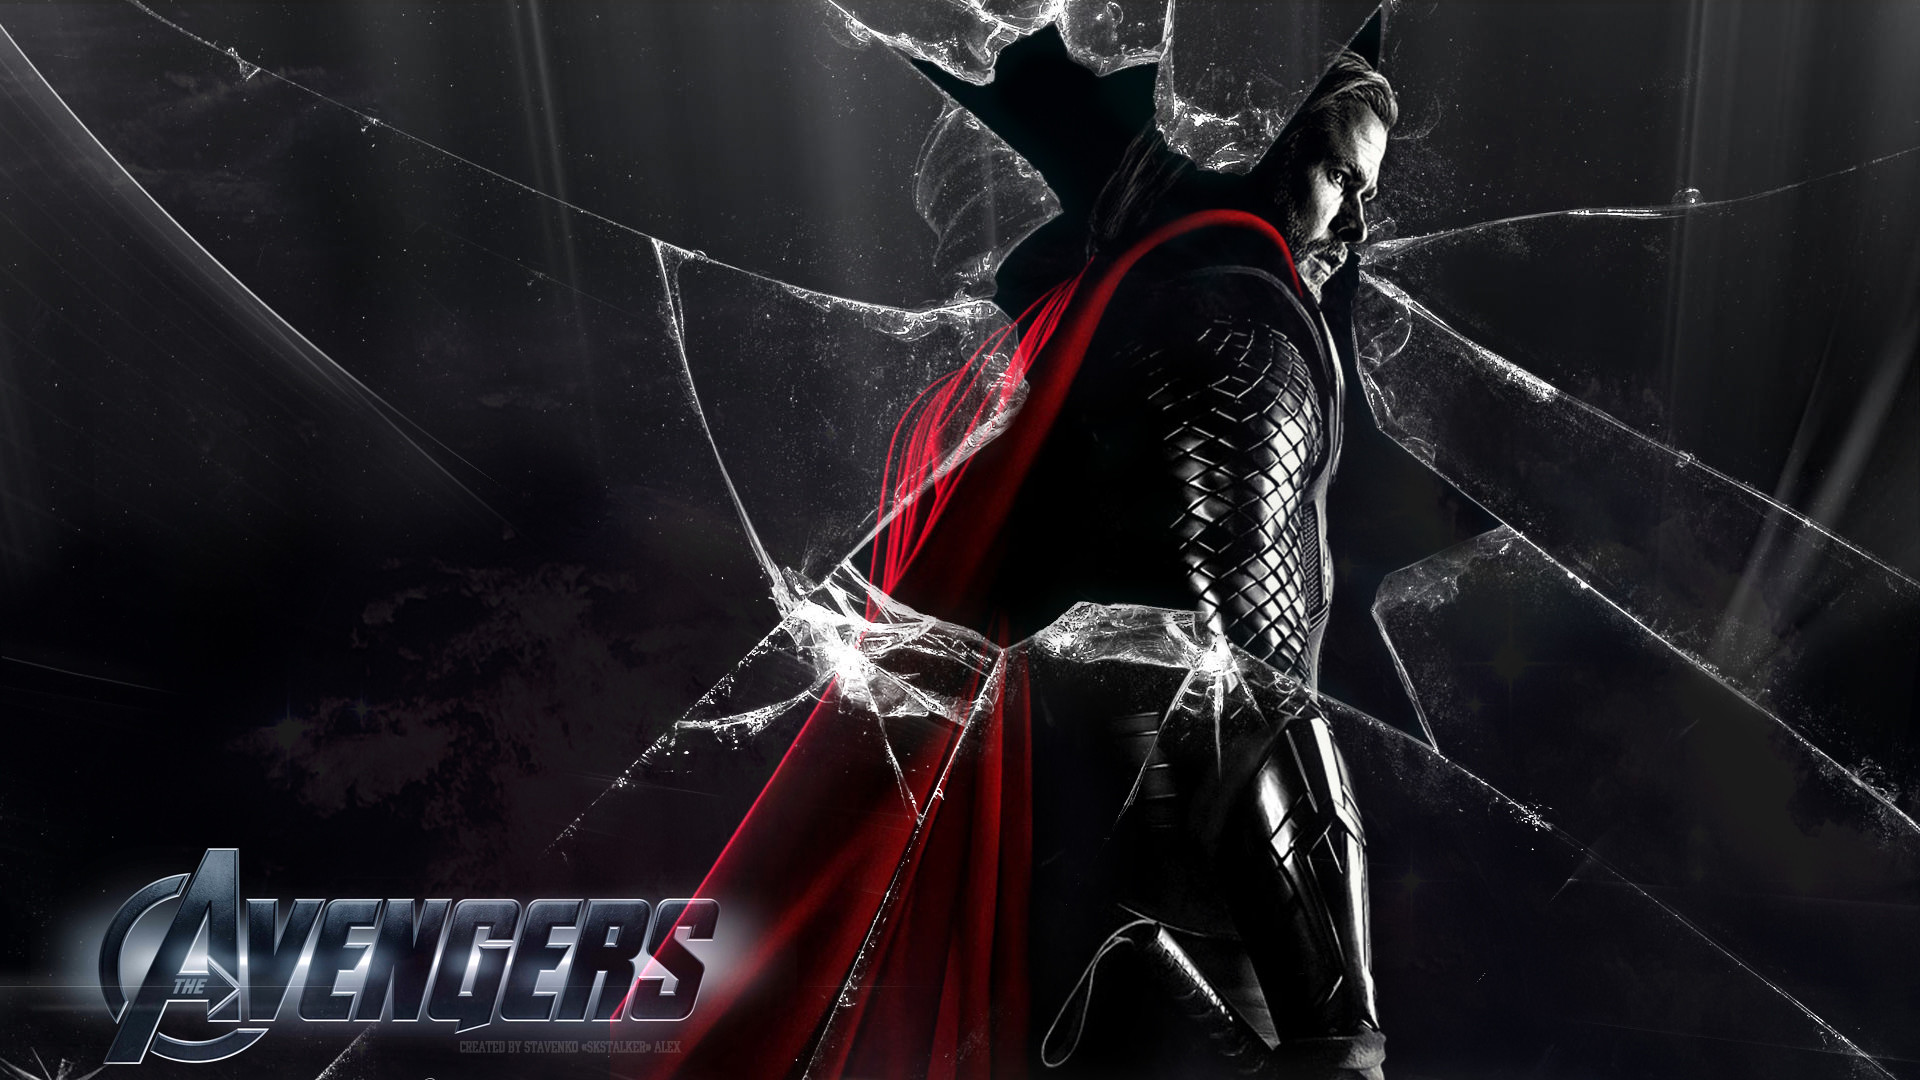 Avengers Thor HD Wallpaper #214 Wallpapers